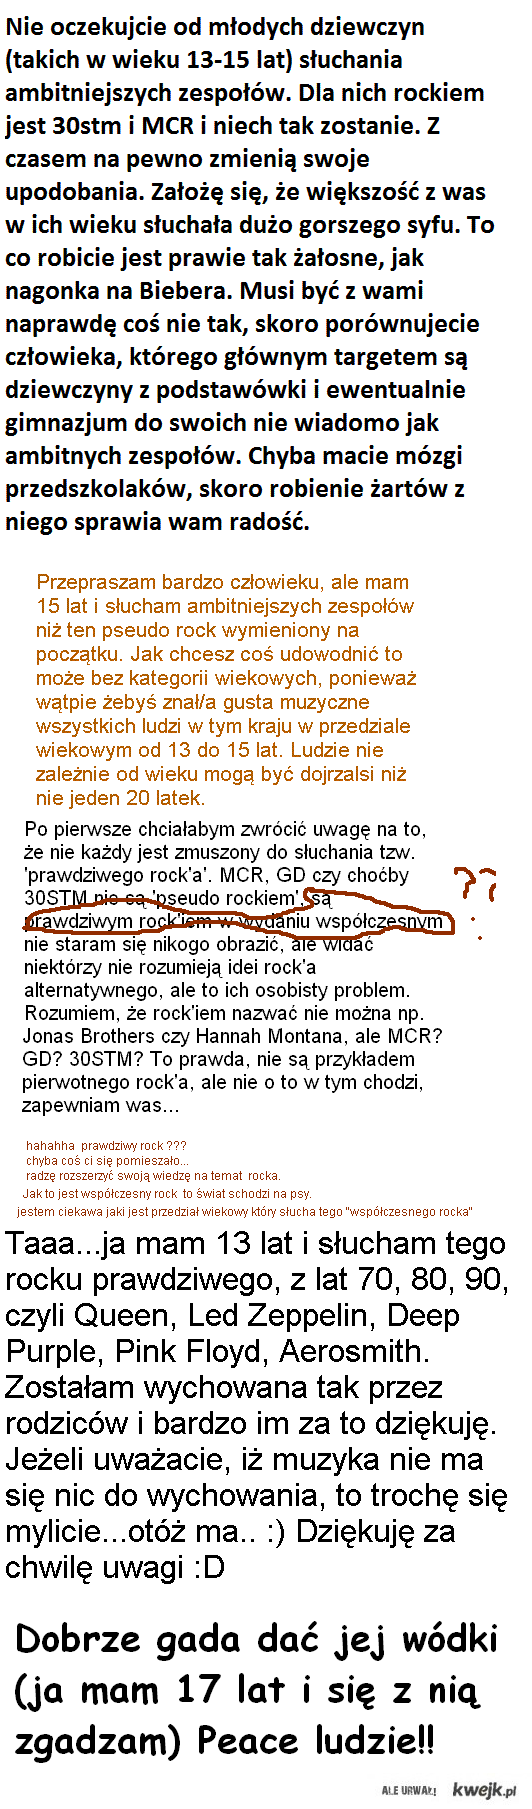 Dac_jej_vodki